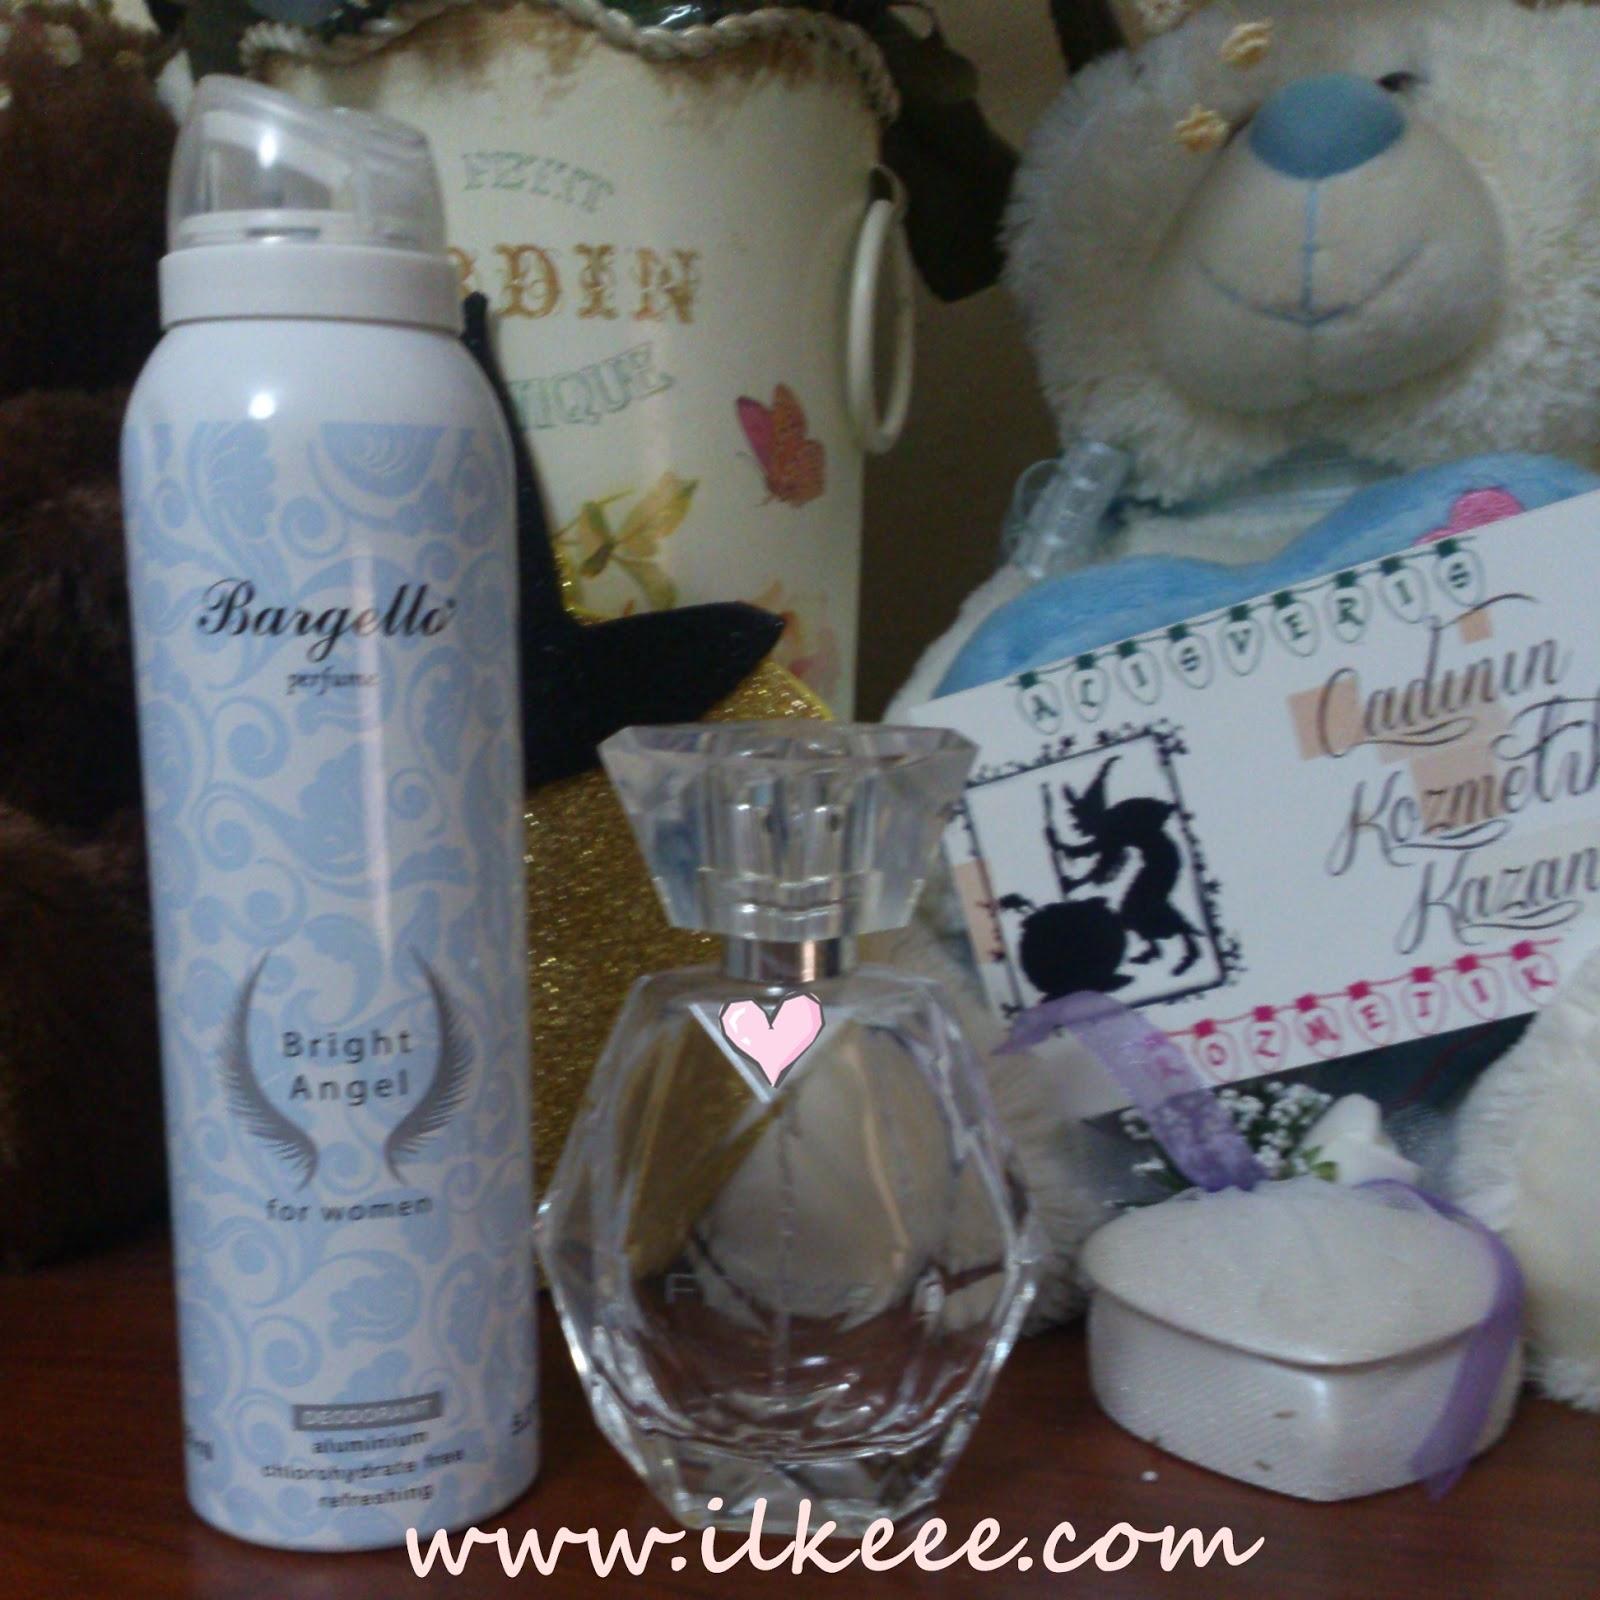 Avon Bayan Parfümleri - Avon Femme Edp - Femme Edp kullananlar - Bargello Perfume - Bargello Bright Angel